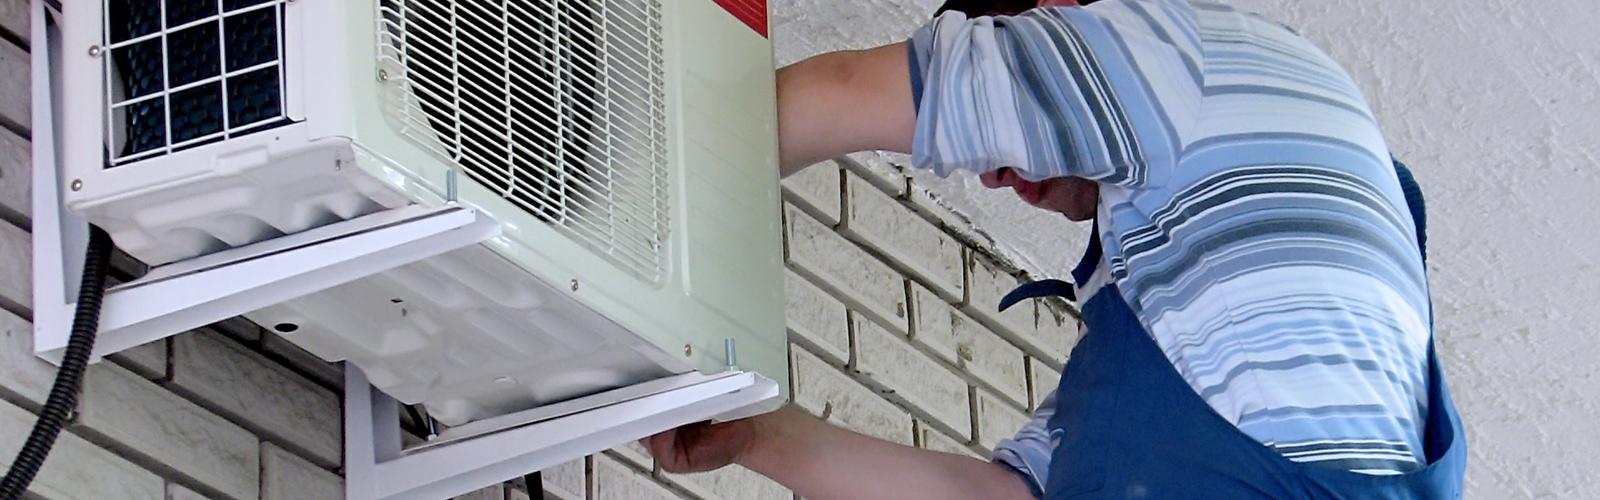 Ventilation repair